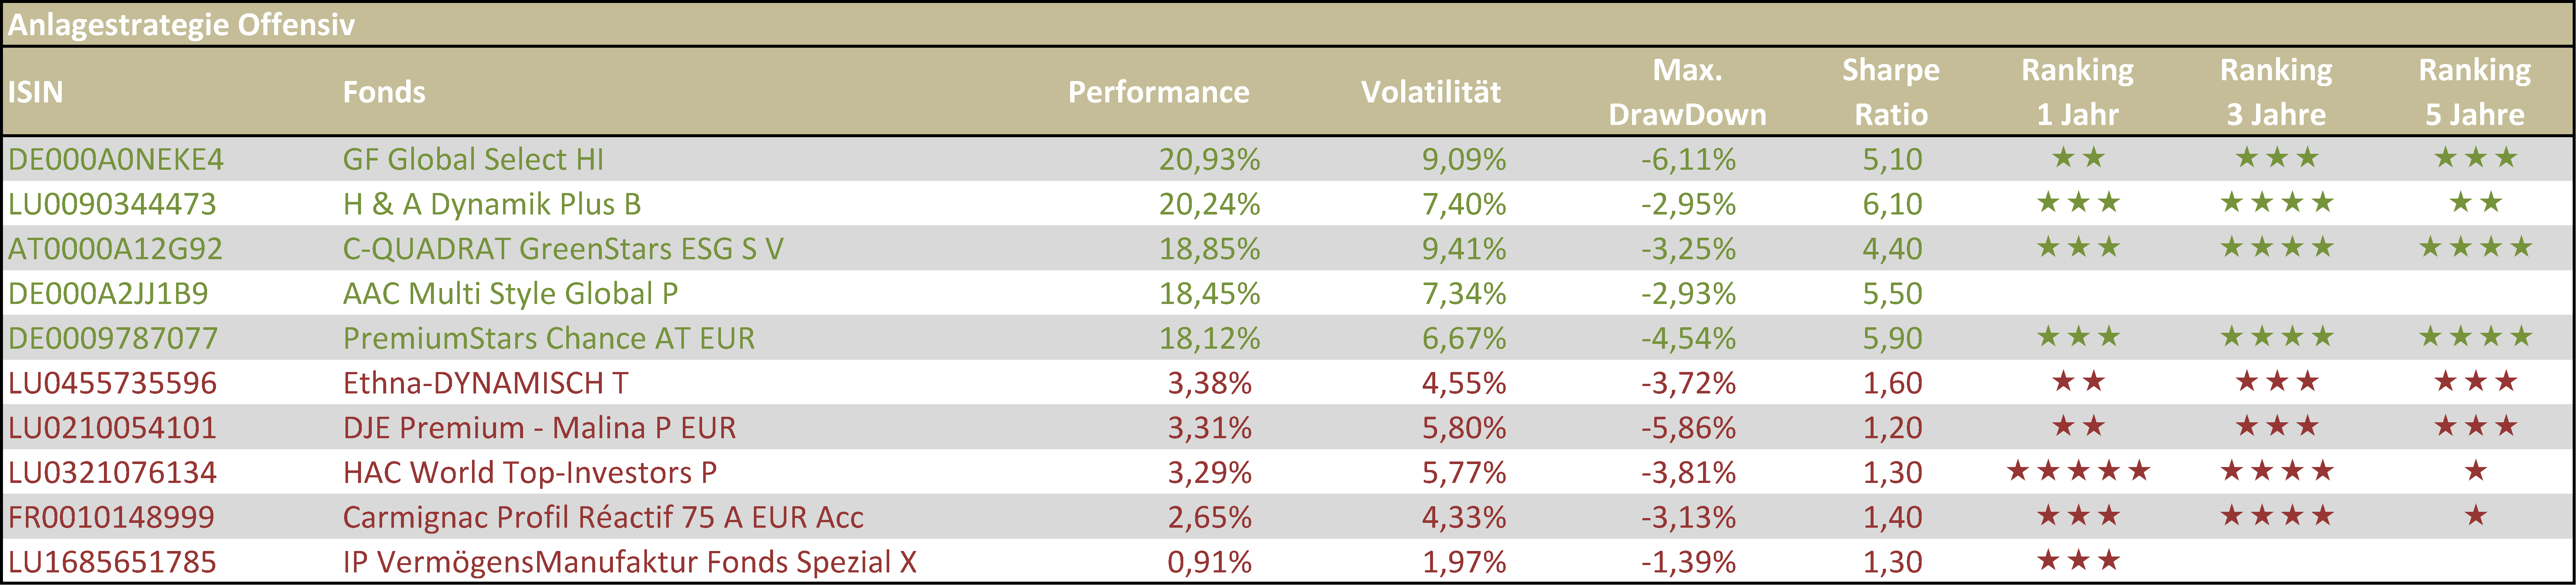 Tabelle 3 - Beste und schlechteste offensive VV-Fonds HJ 1 2019